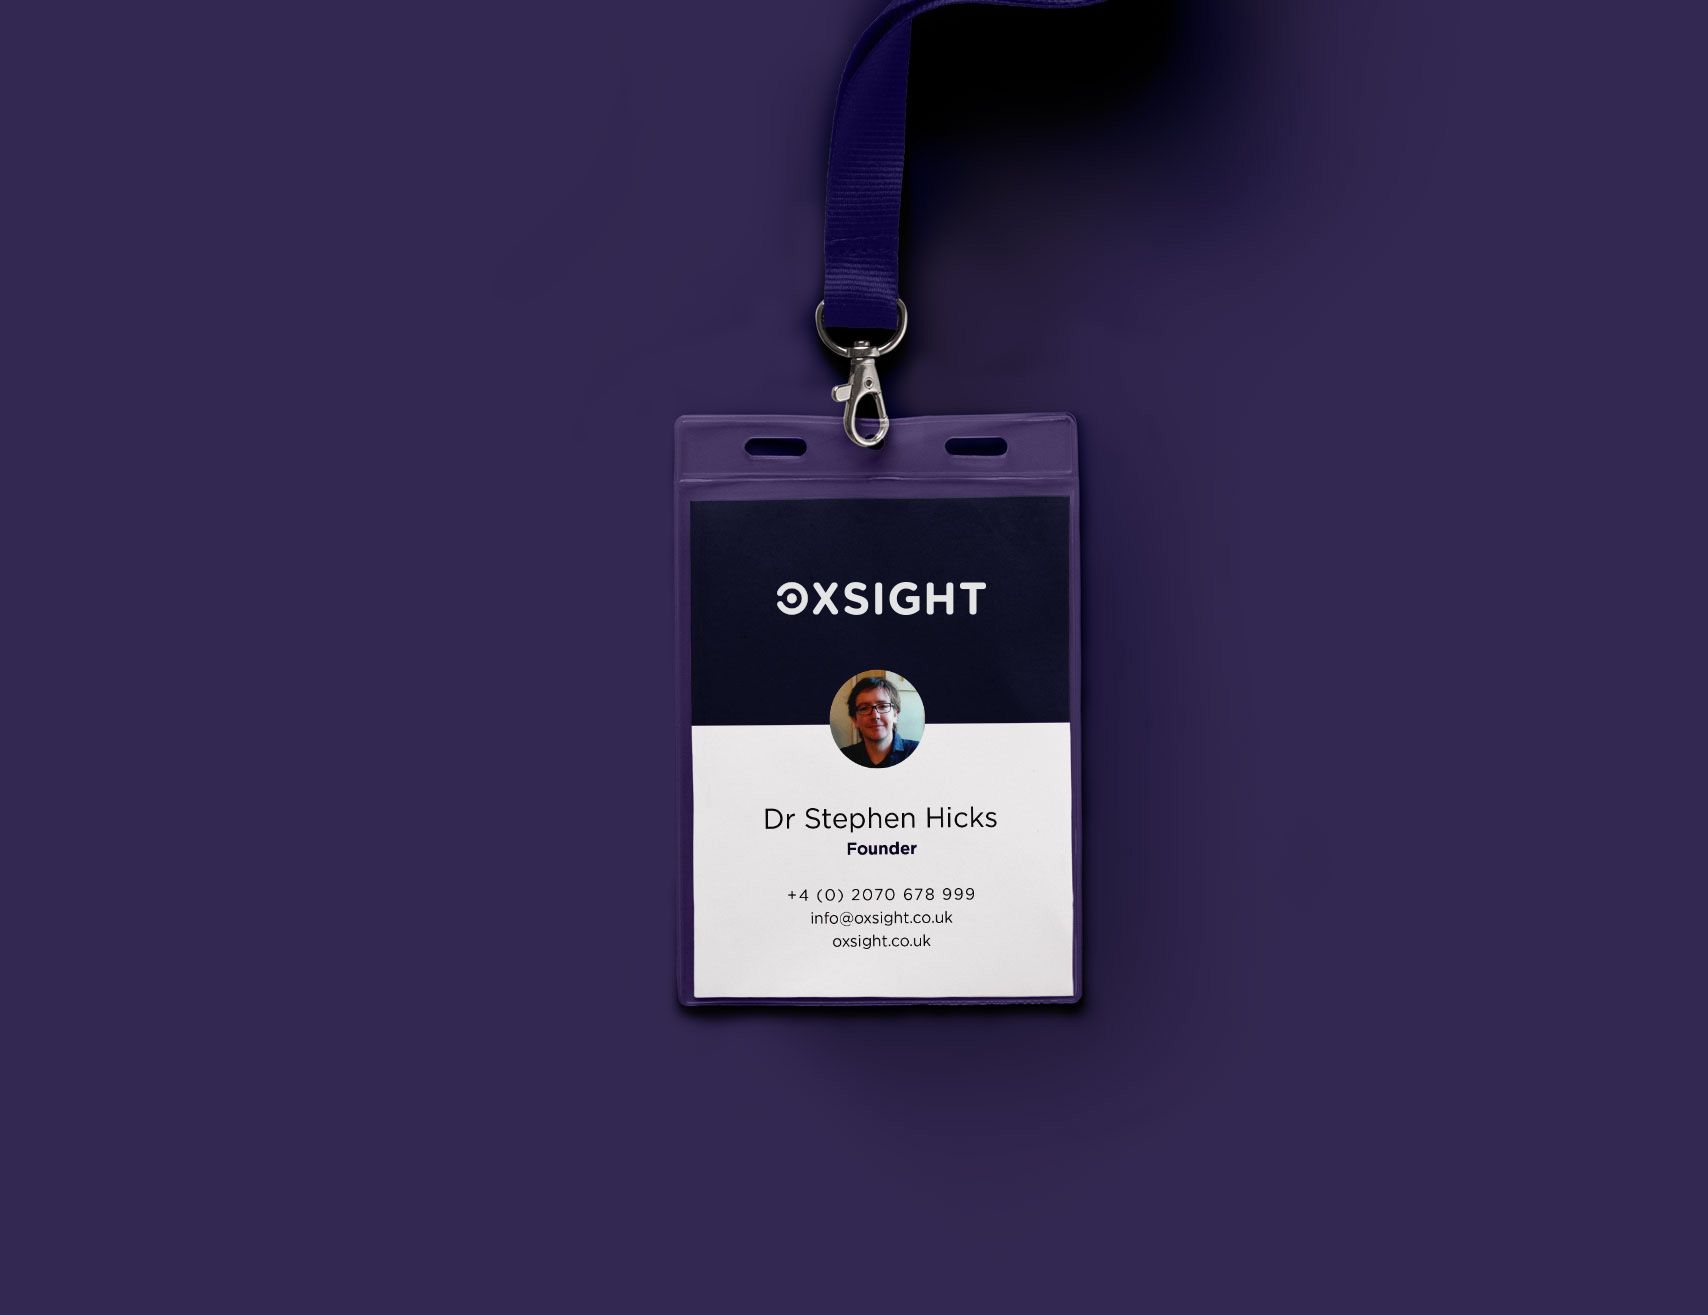 OXsight-Lanyard-2